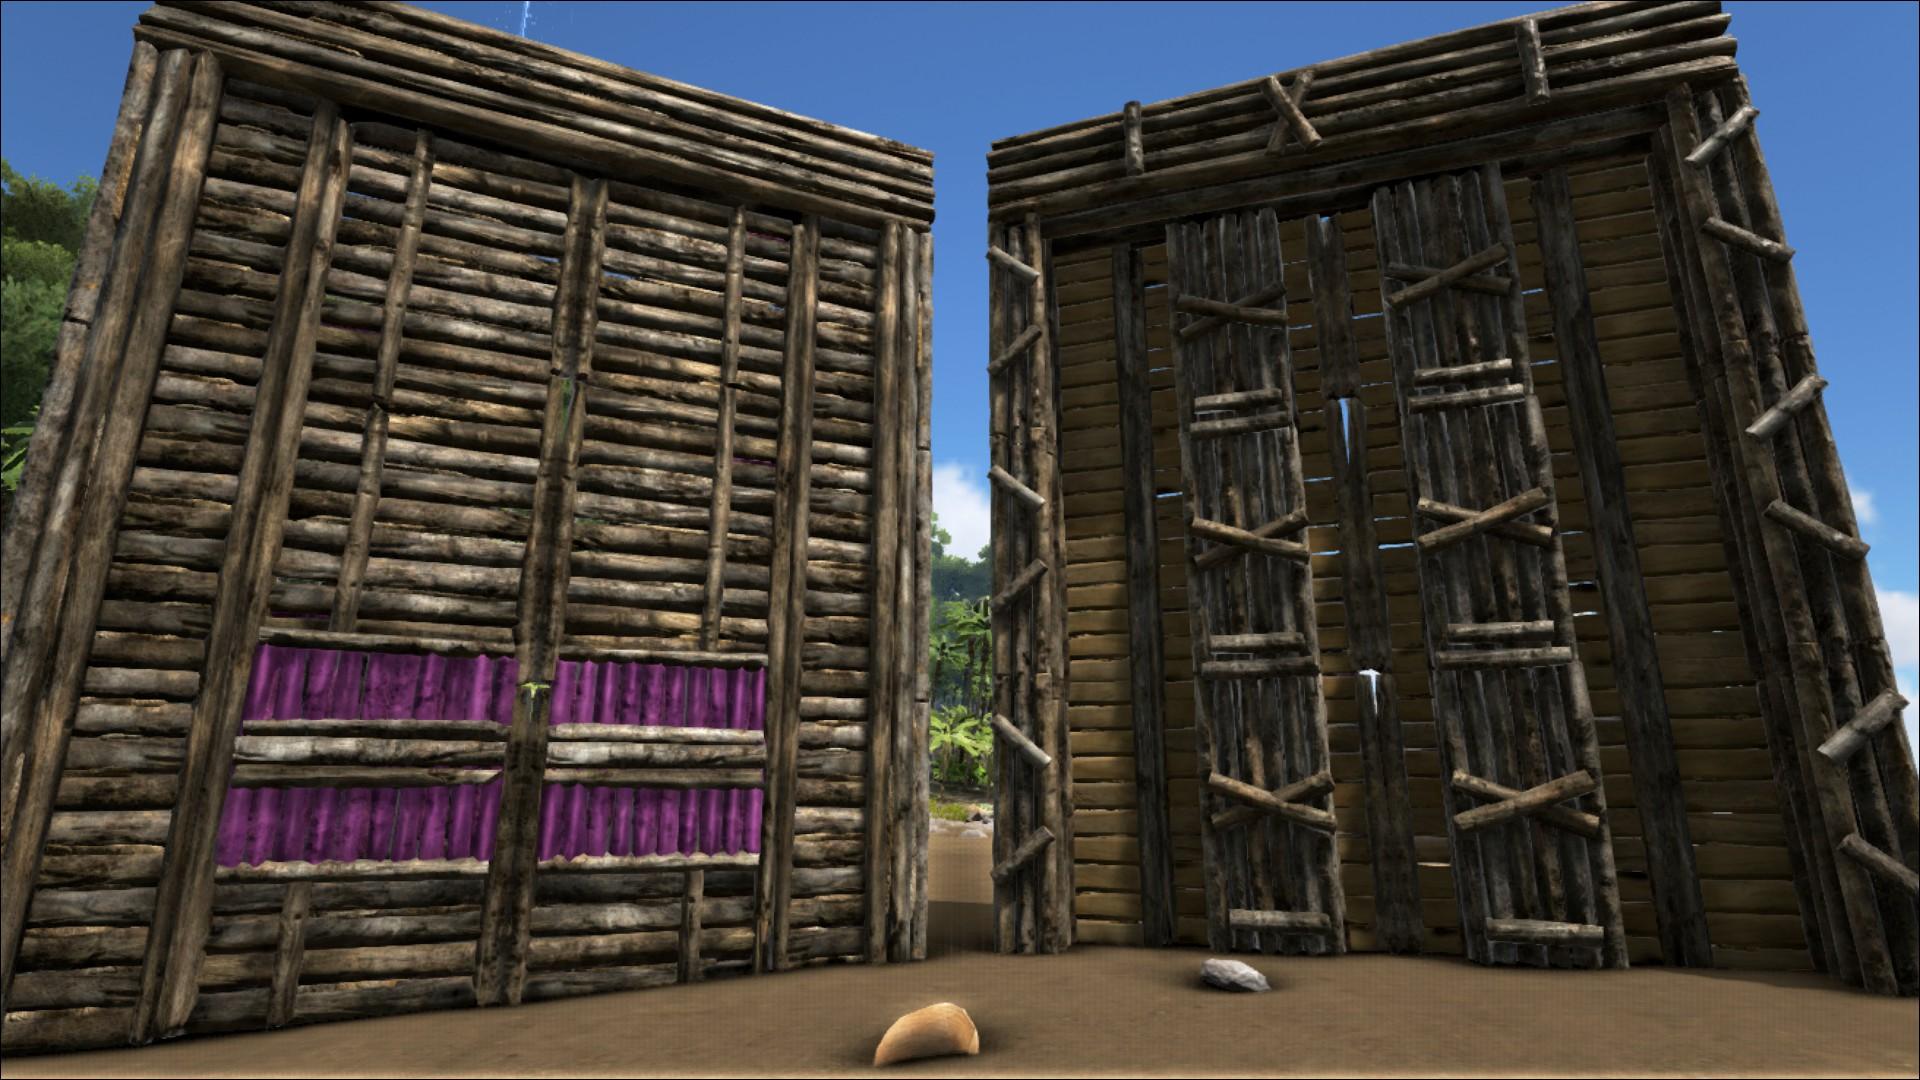 Region 1 Region 2 Region 3 ... & Dinosaur Gate - Official ARK: Survival Evolved Wiki Pezcame.Com